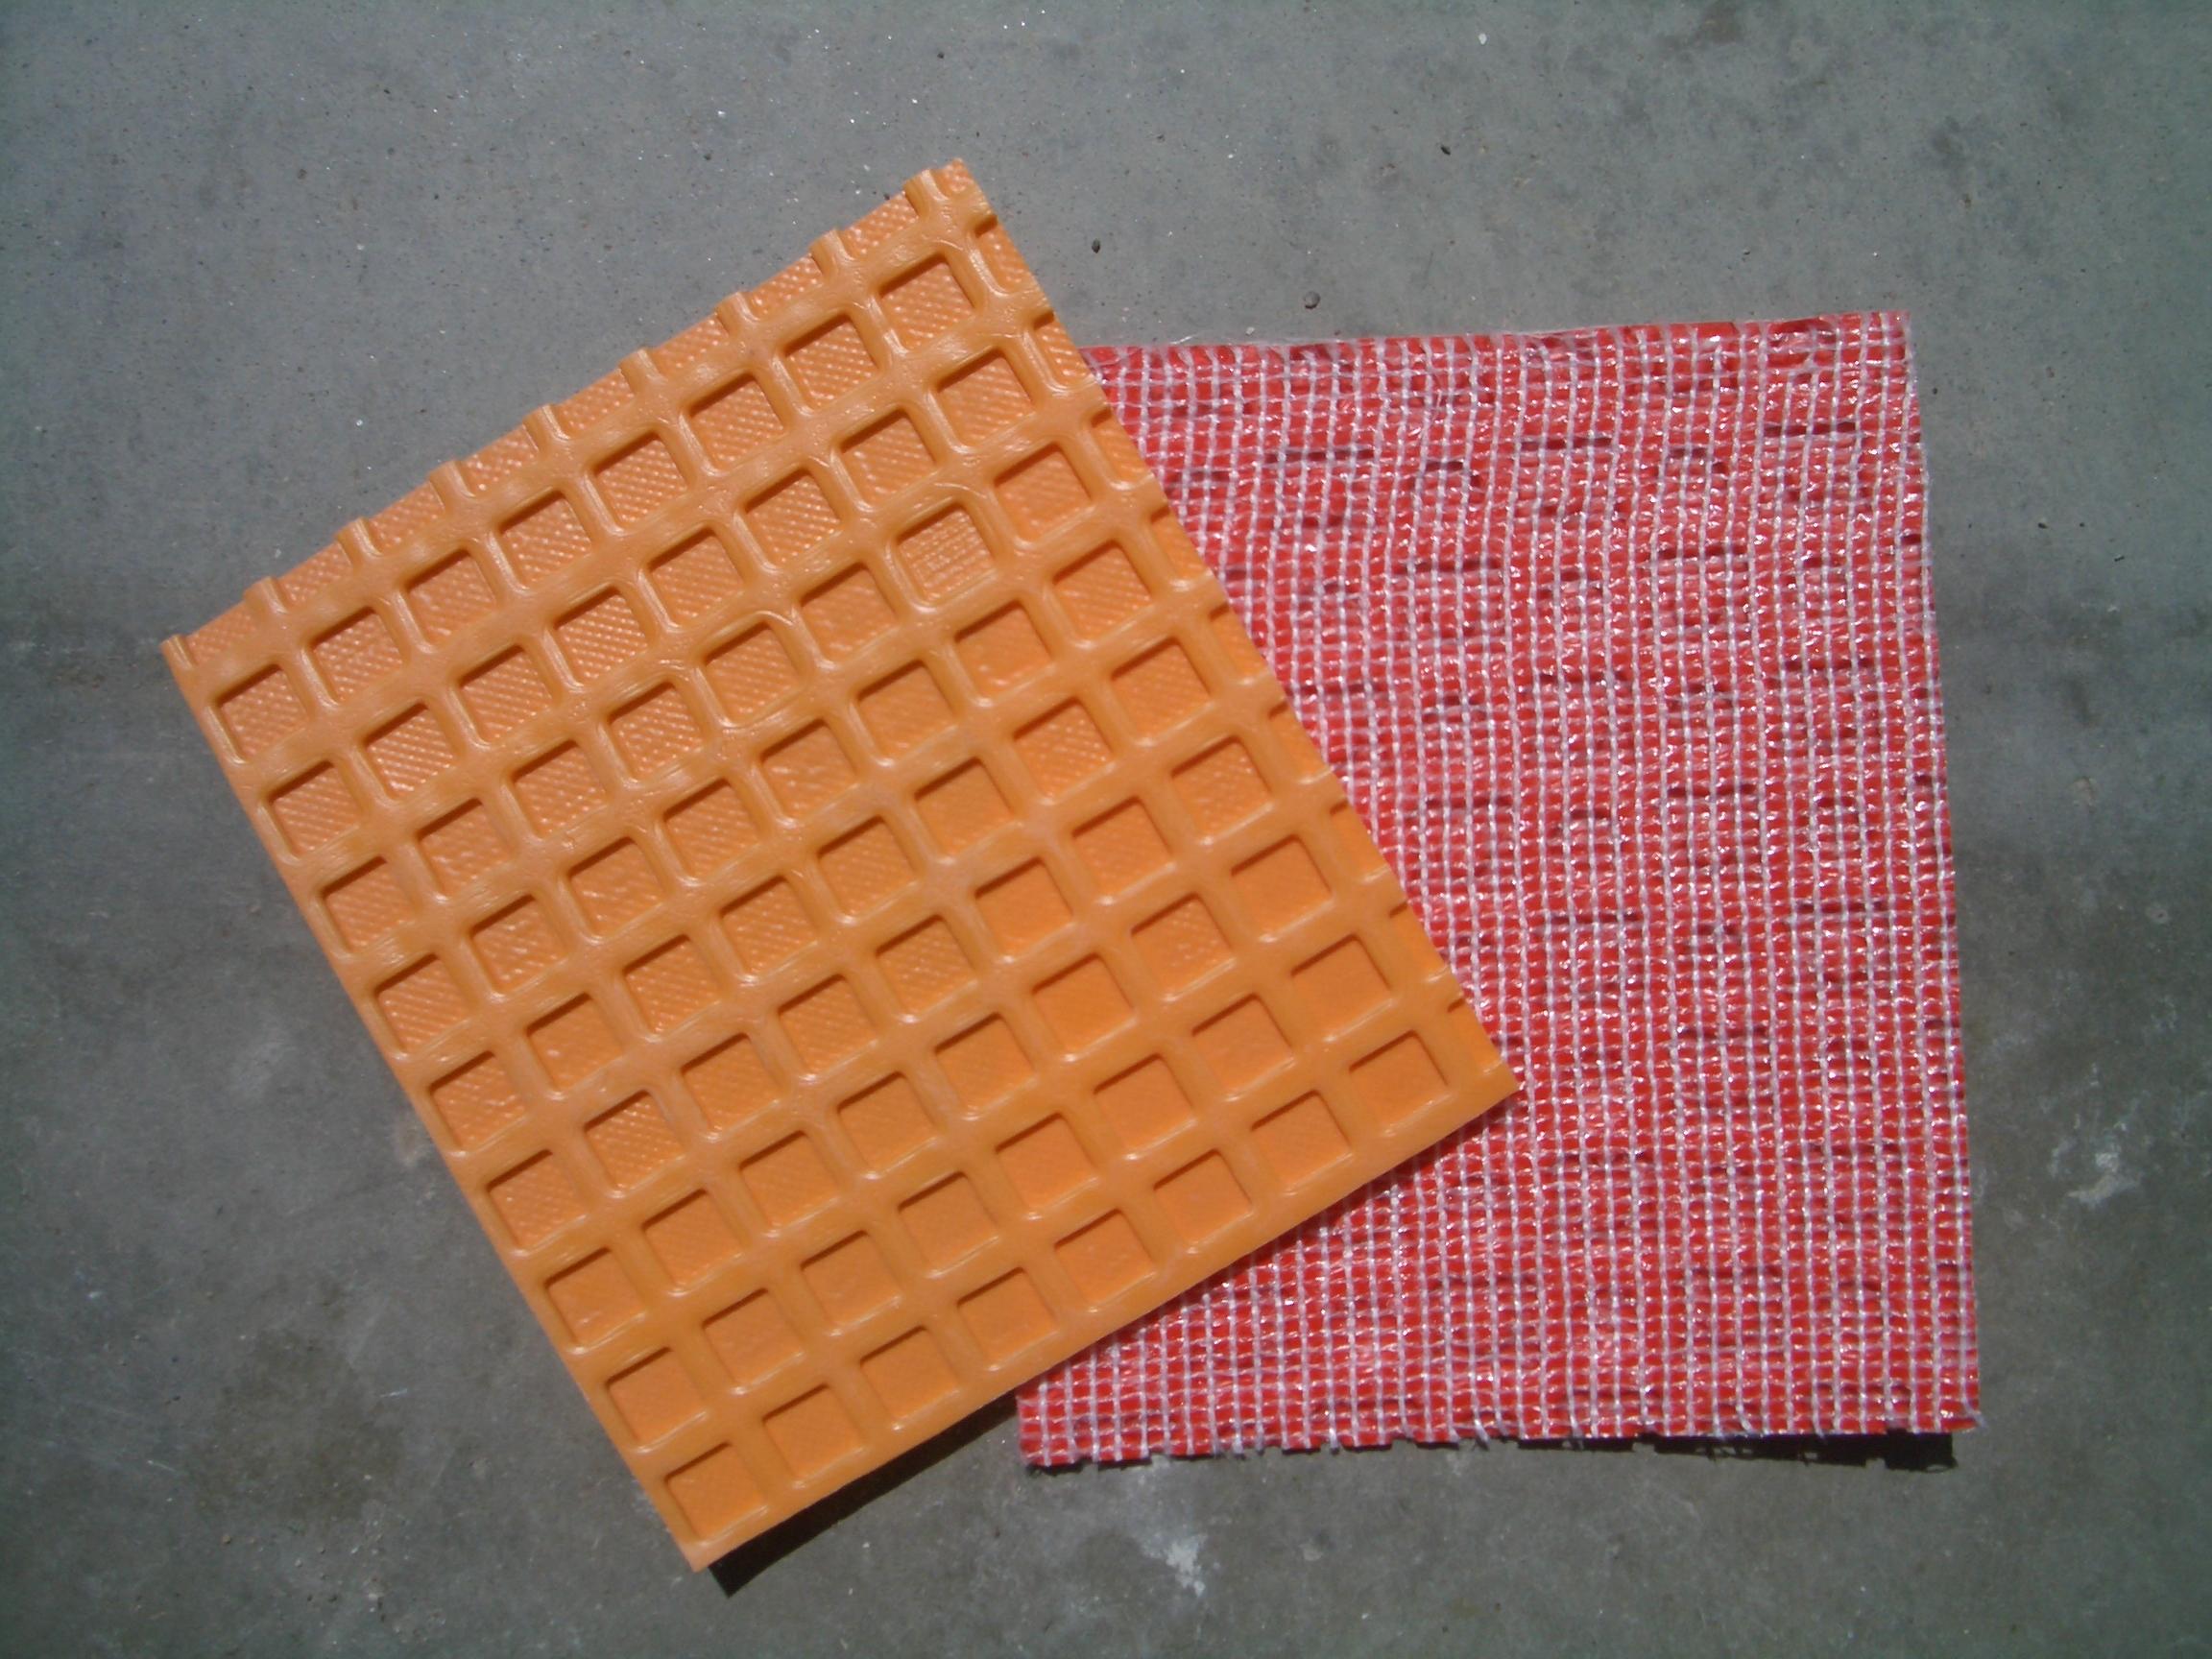 85 SqFt PROVA-MAT Waterproofing Polypropylene Membrane 15 Mil Thick by Squar Foot